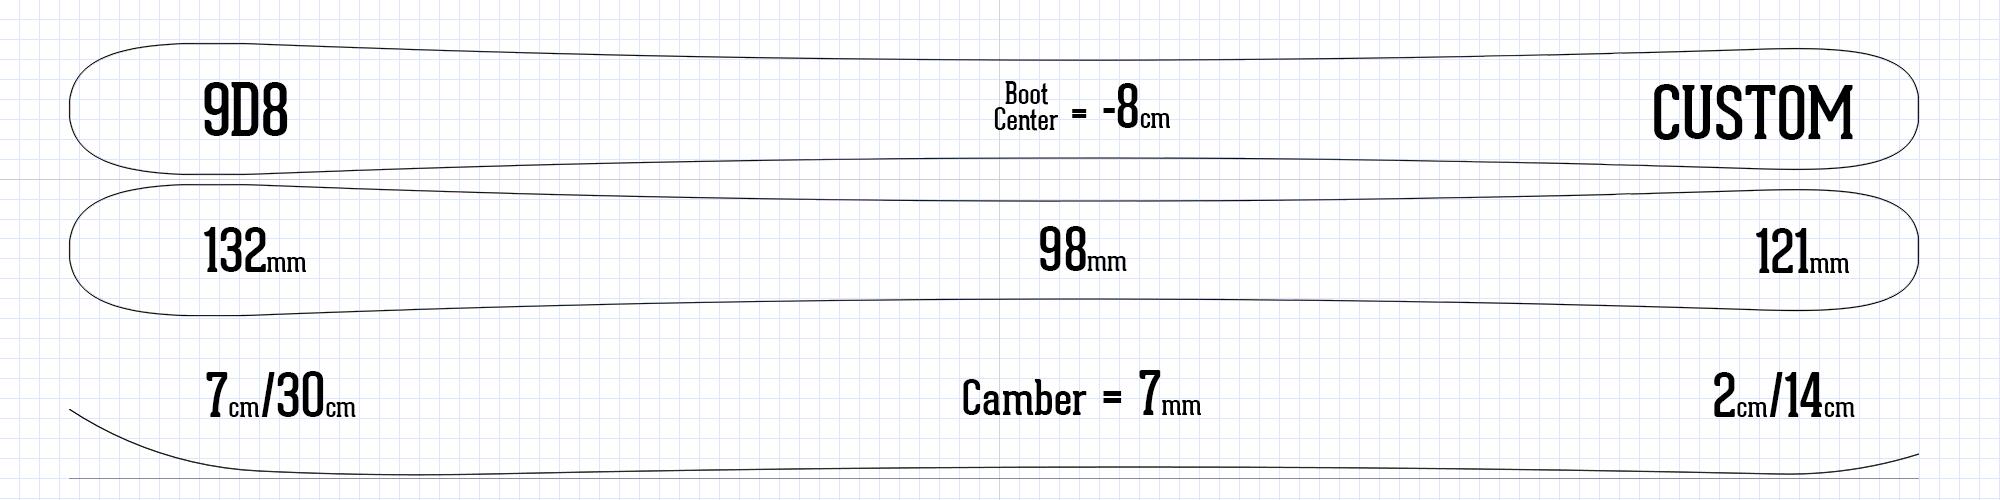 9D8 ski information sheet specs rocker camber profile